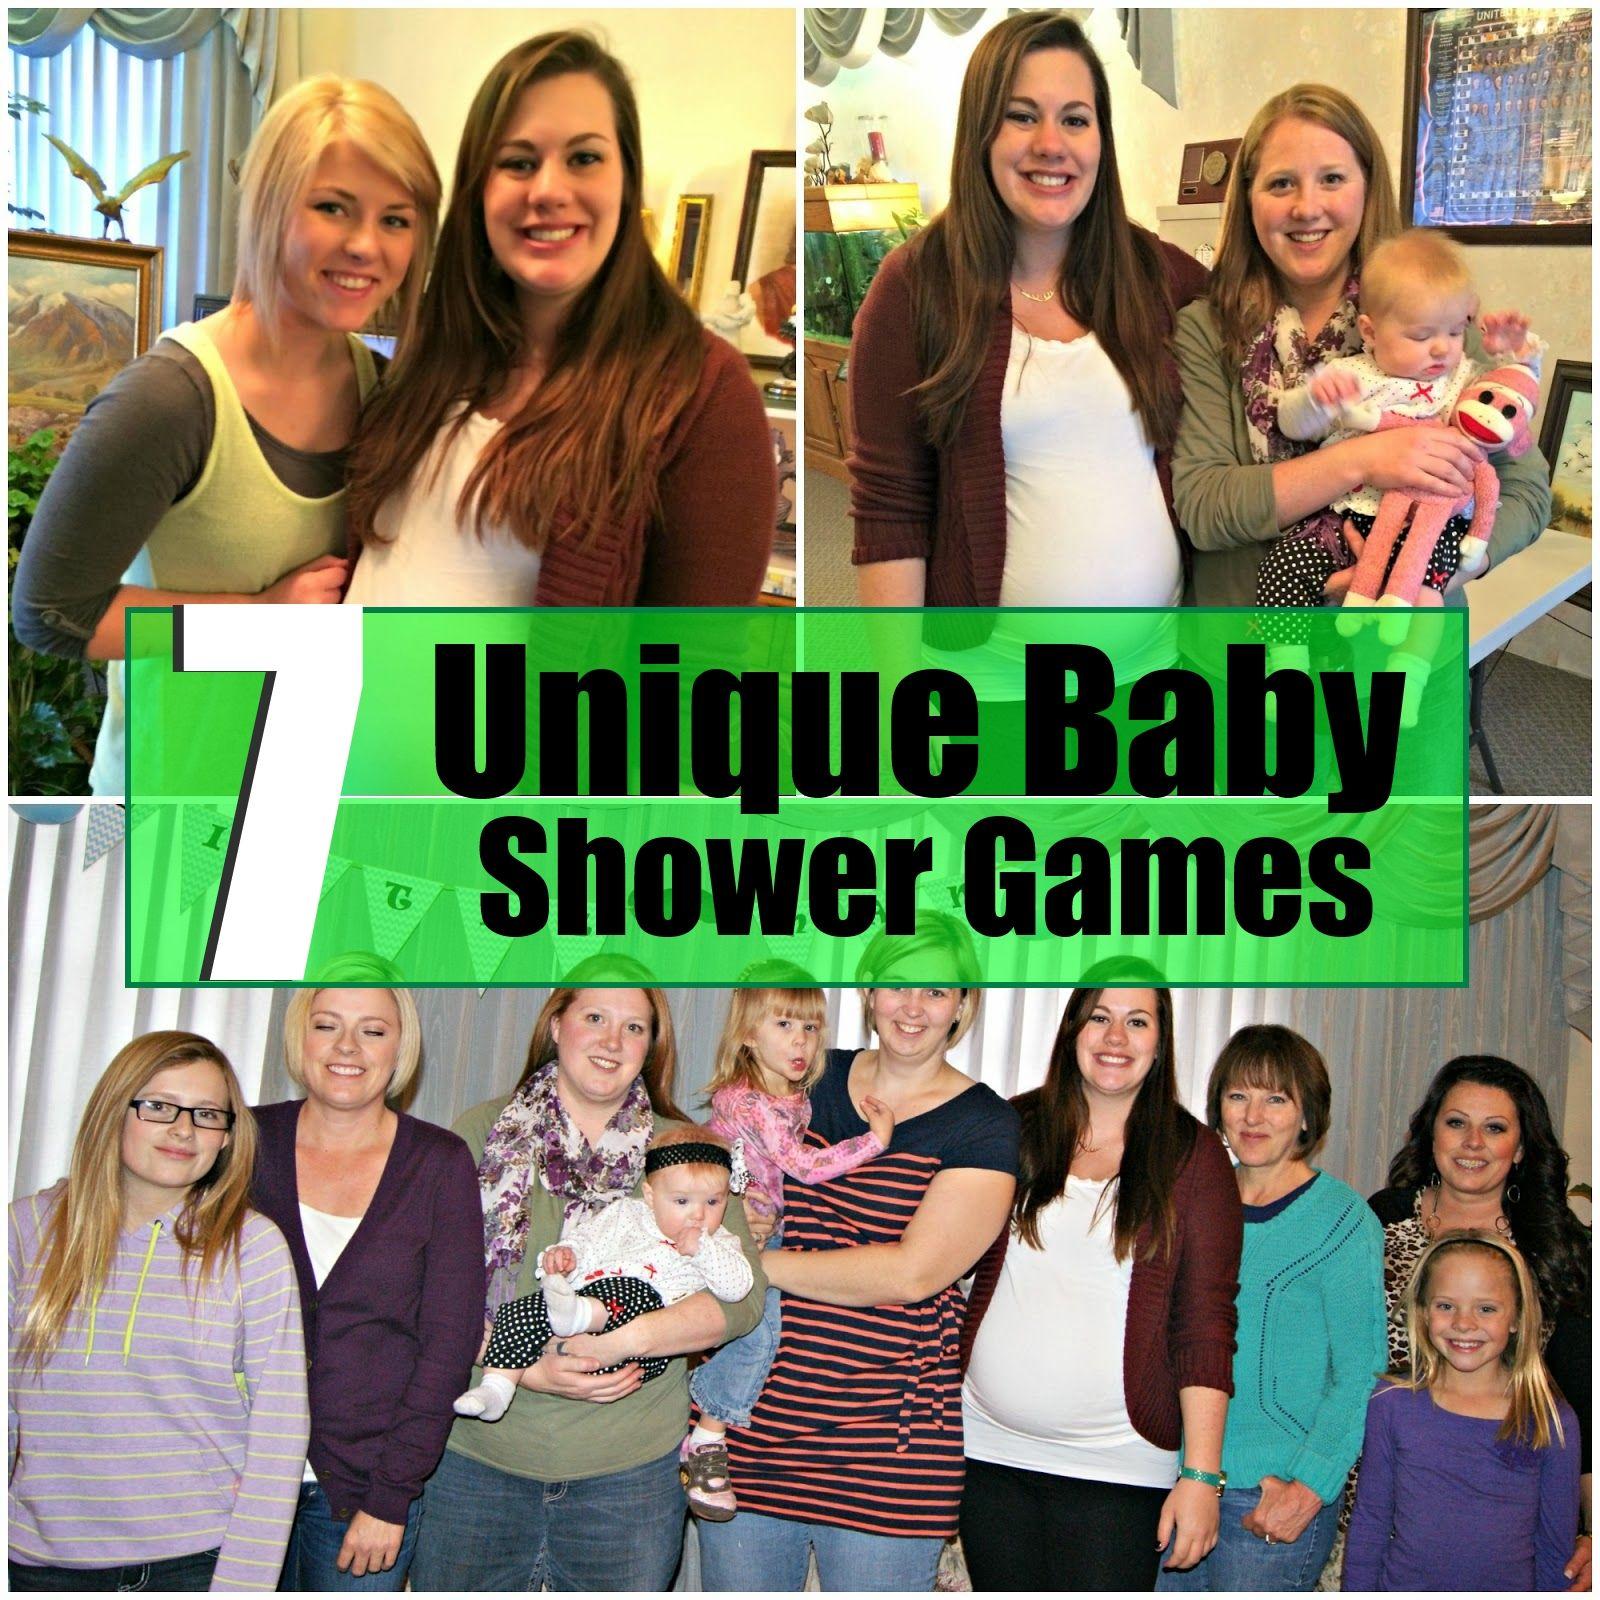 Baby shower games: Thinking games | BabyCenter